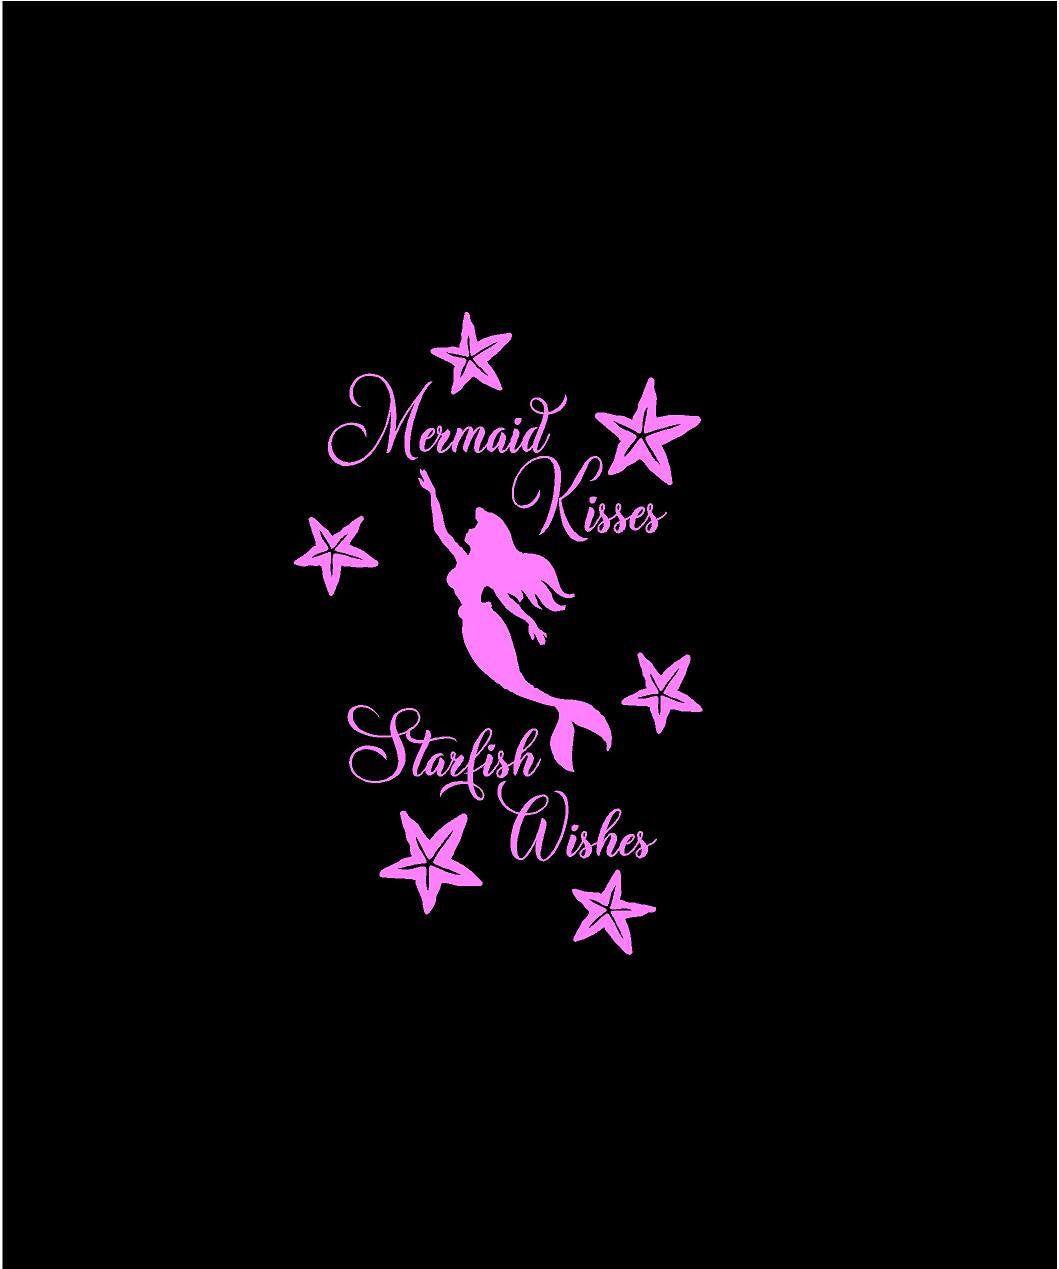 Mermaid Kisses And Starfish Wishes Decal Custom Vinyl Fairy Light Laptop Car Truck Window Sticker Truck Window Stickers Custom Vinyl Window Stickers [ 1269 x 1059 Pixel ]